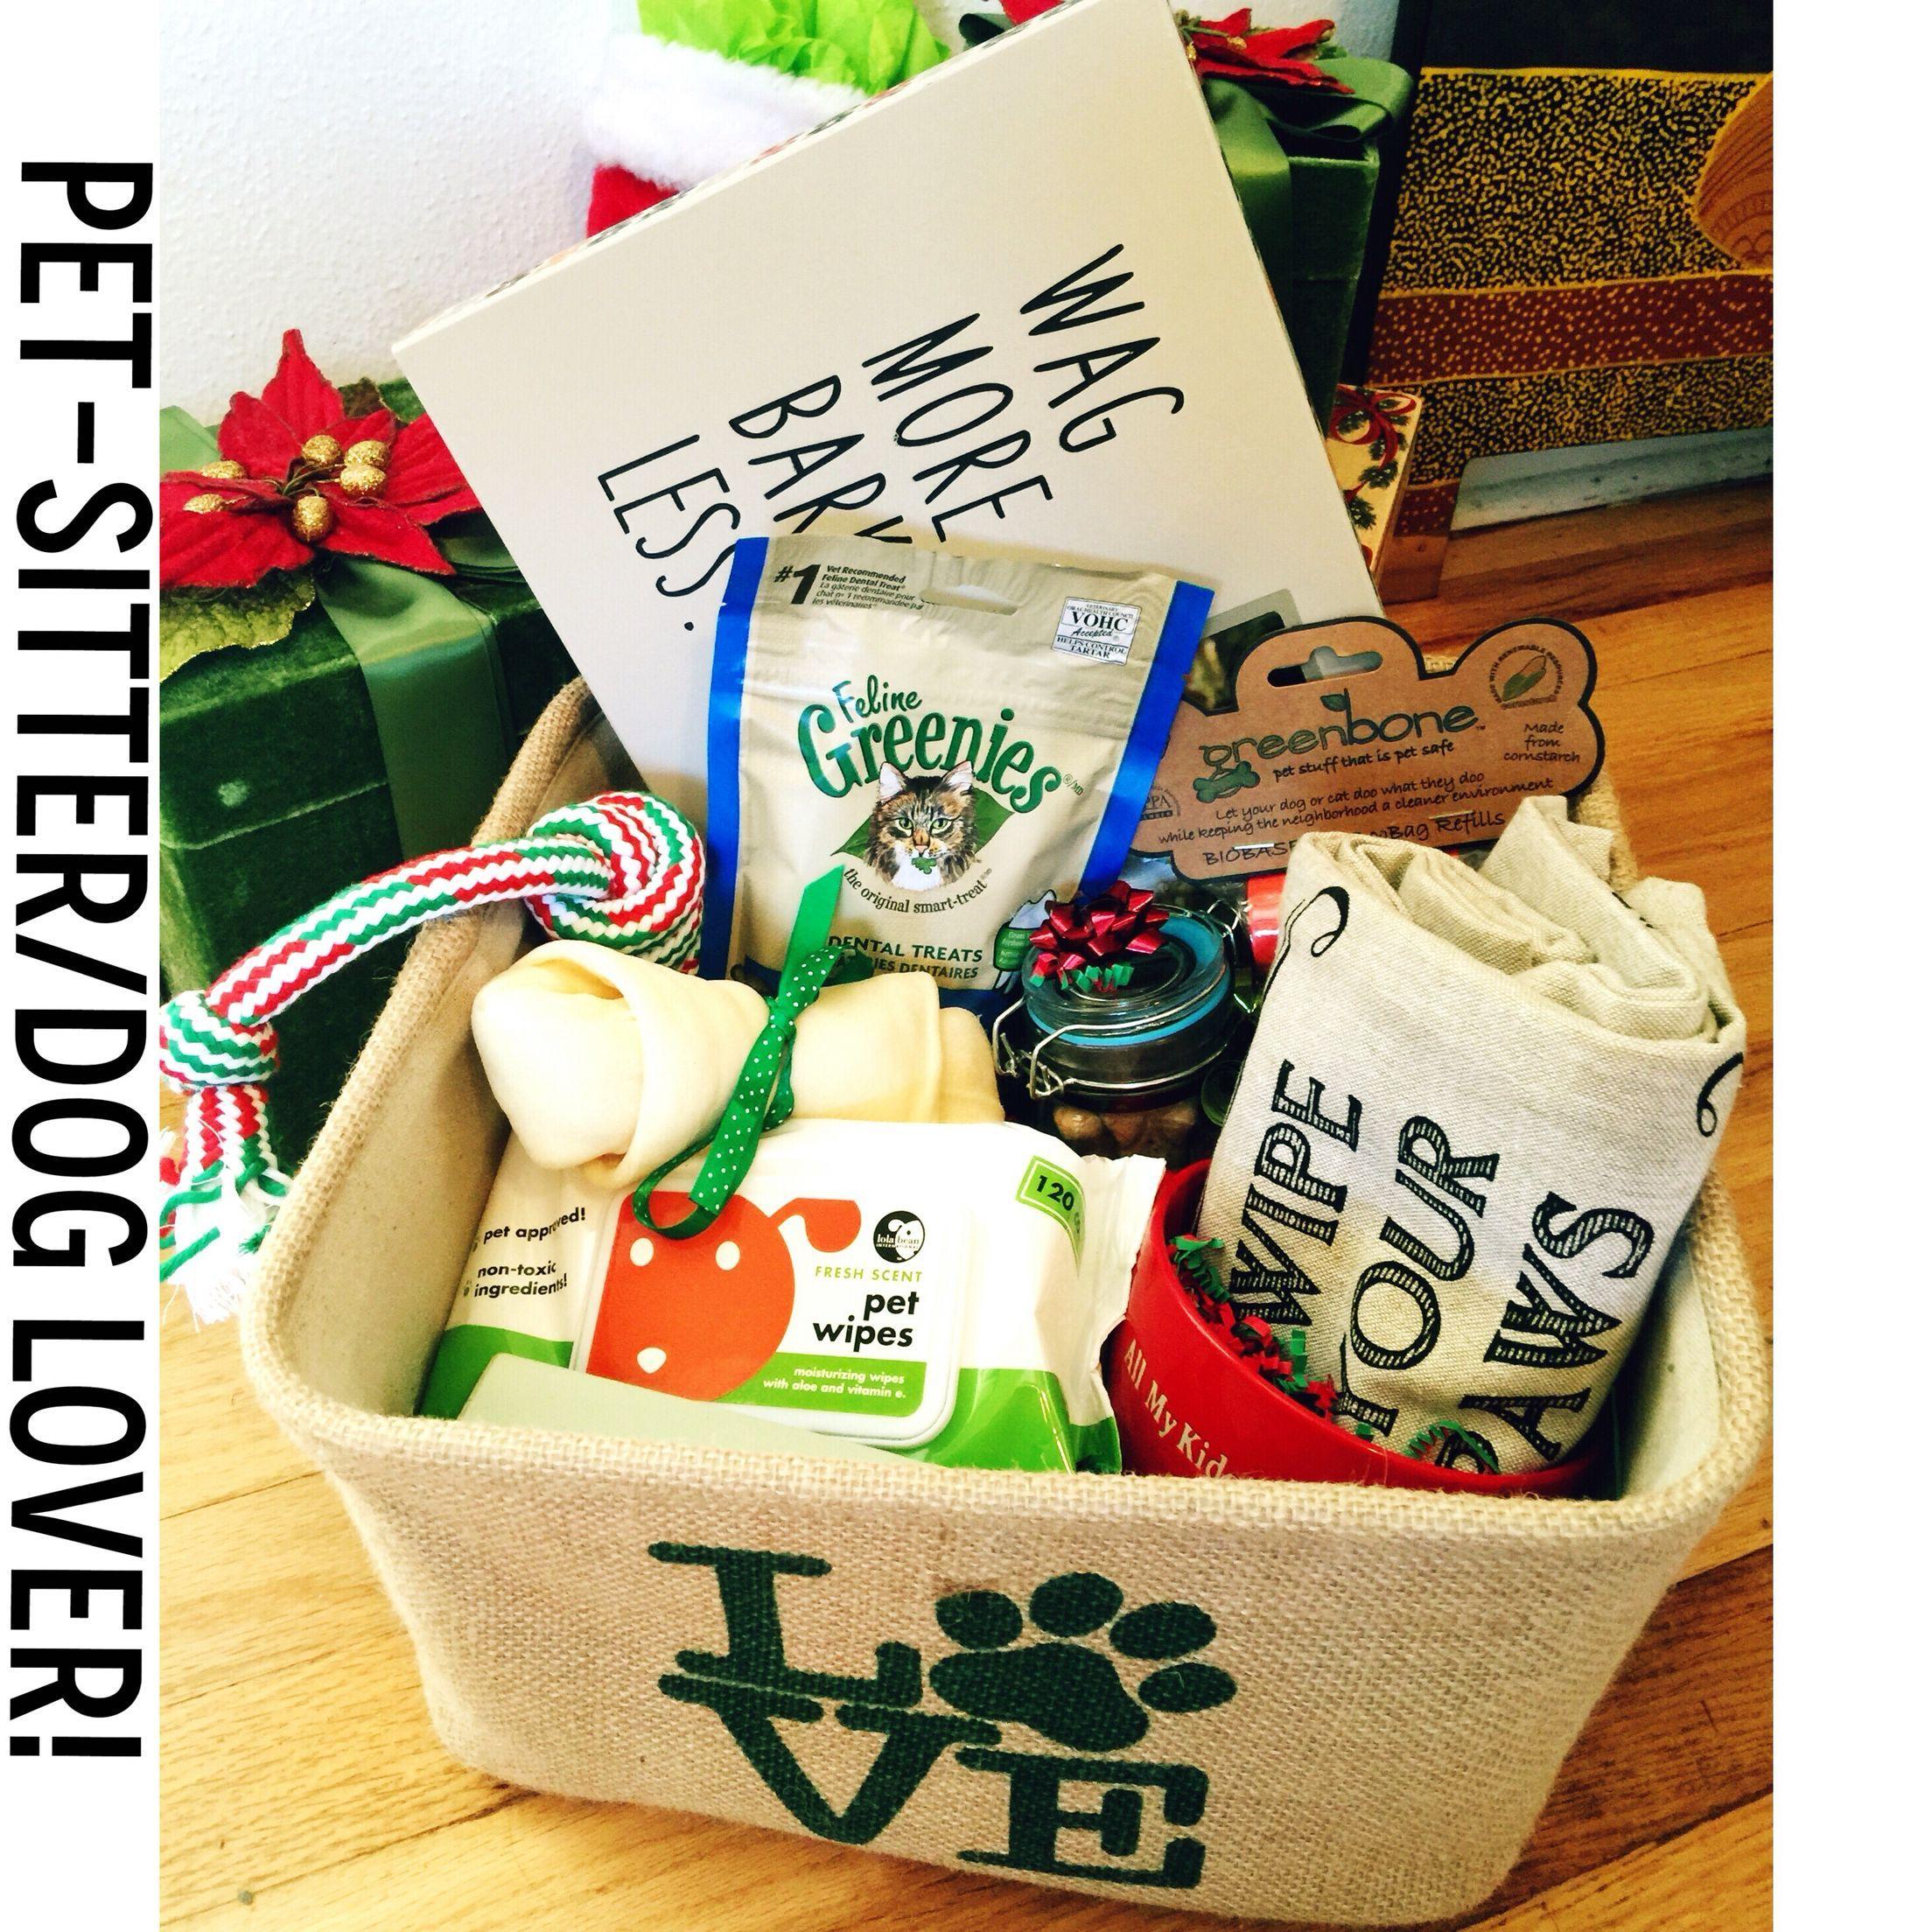 A Thank You Gift Basket I Made For Our Pet Sitter Dog And Kitty Treats Picture Fram Cestas De Regalo Tematicas Regalos De Navidad Hechos En Casa Regalo Perro